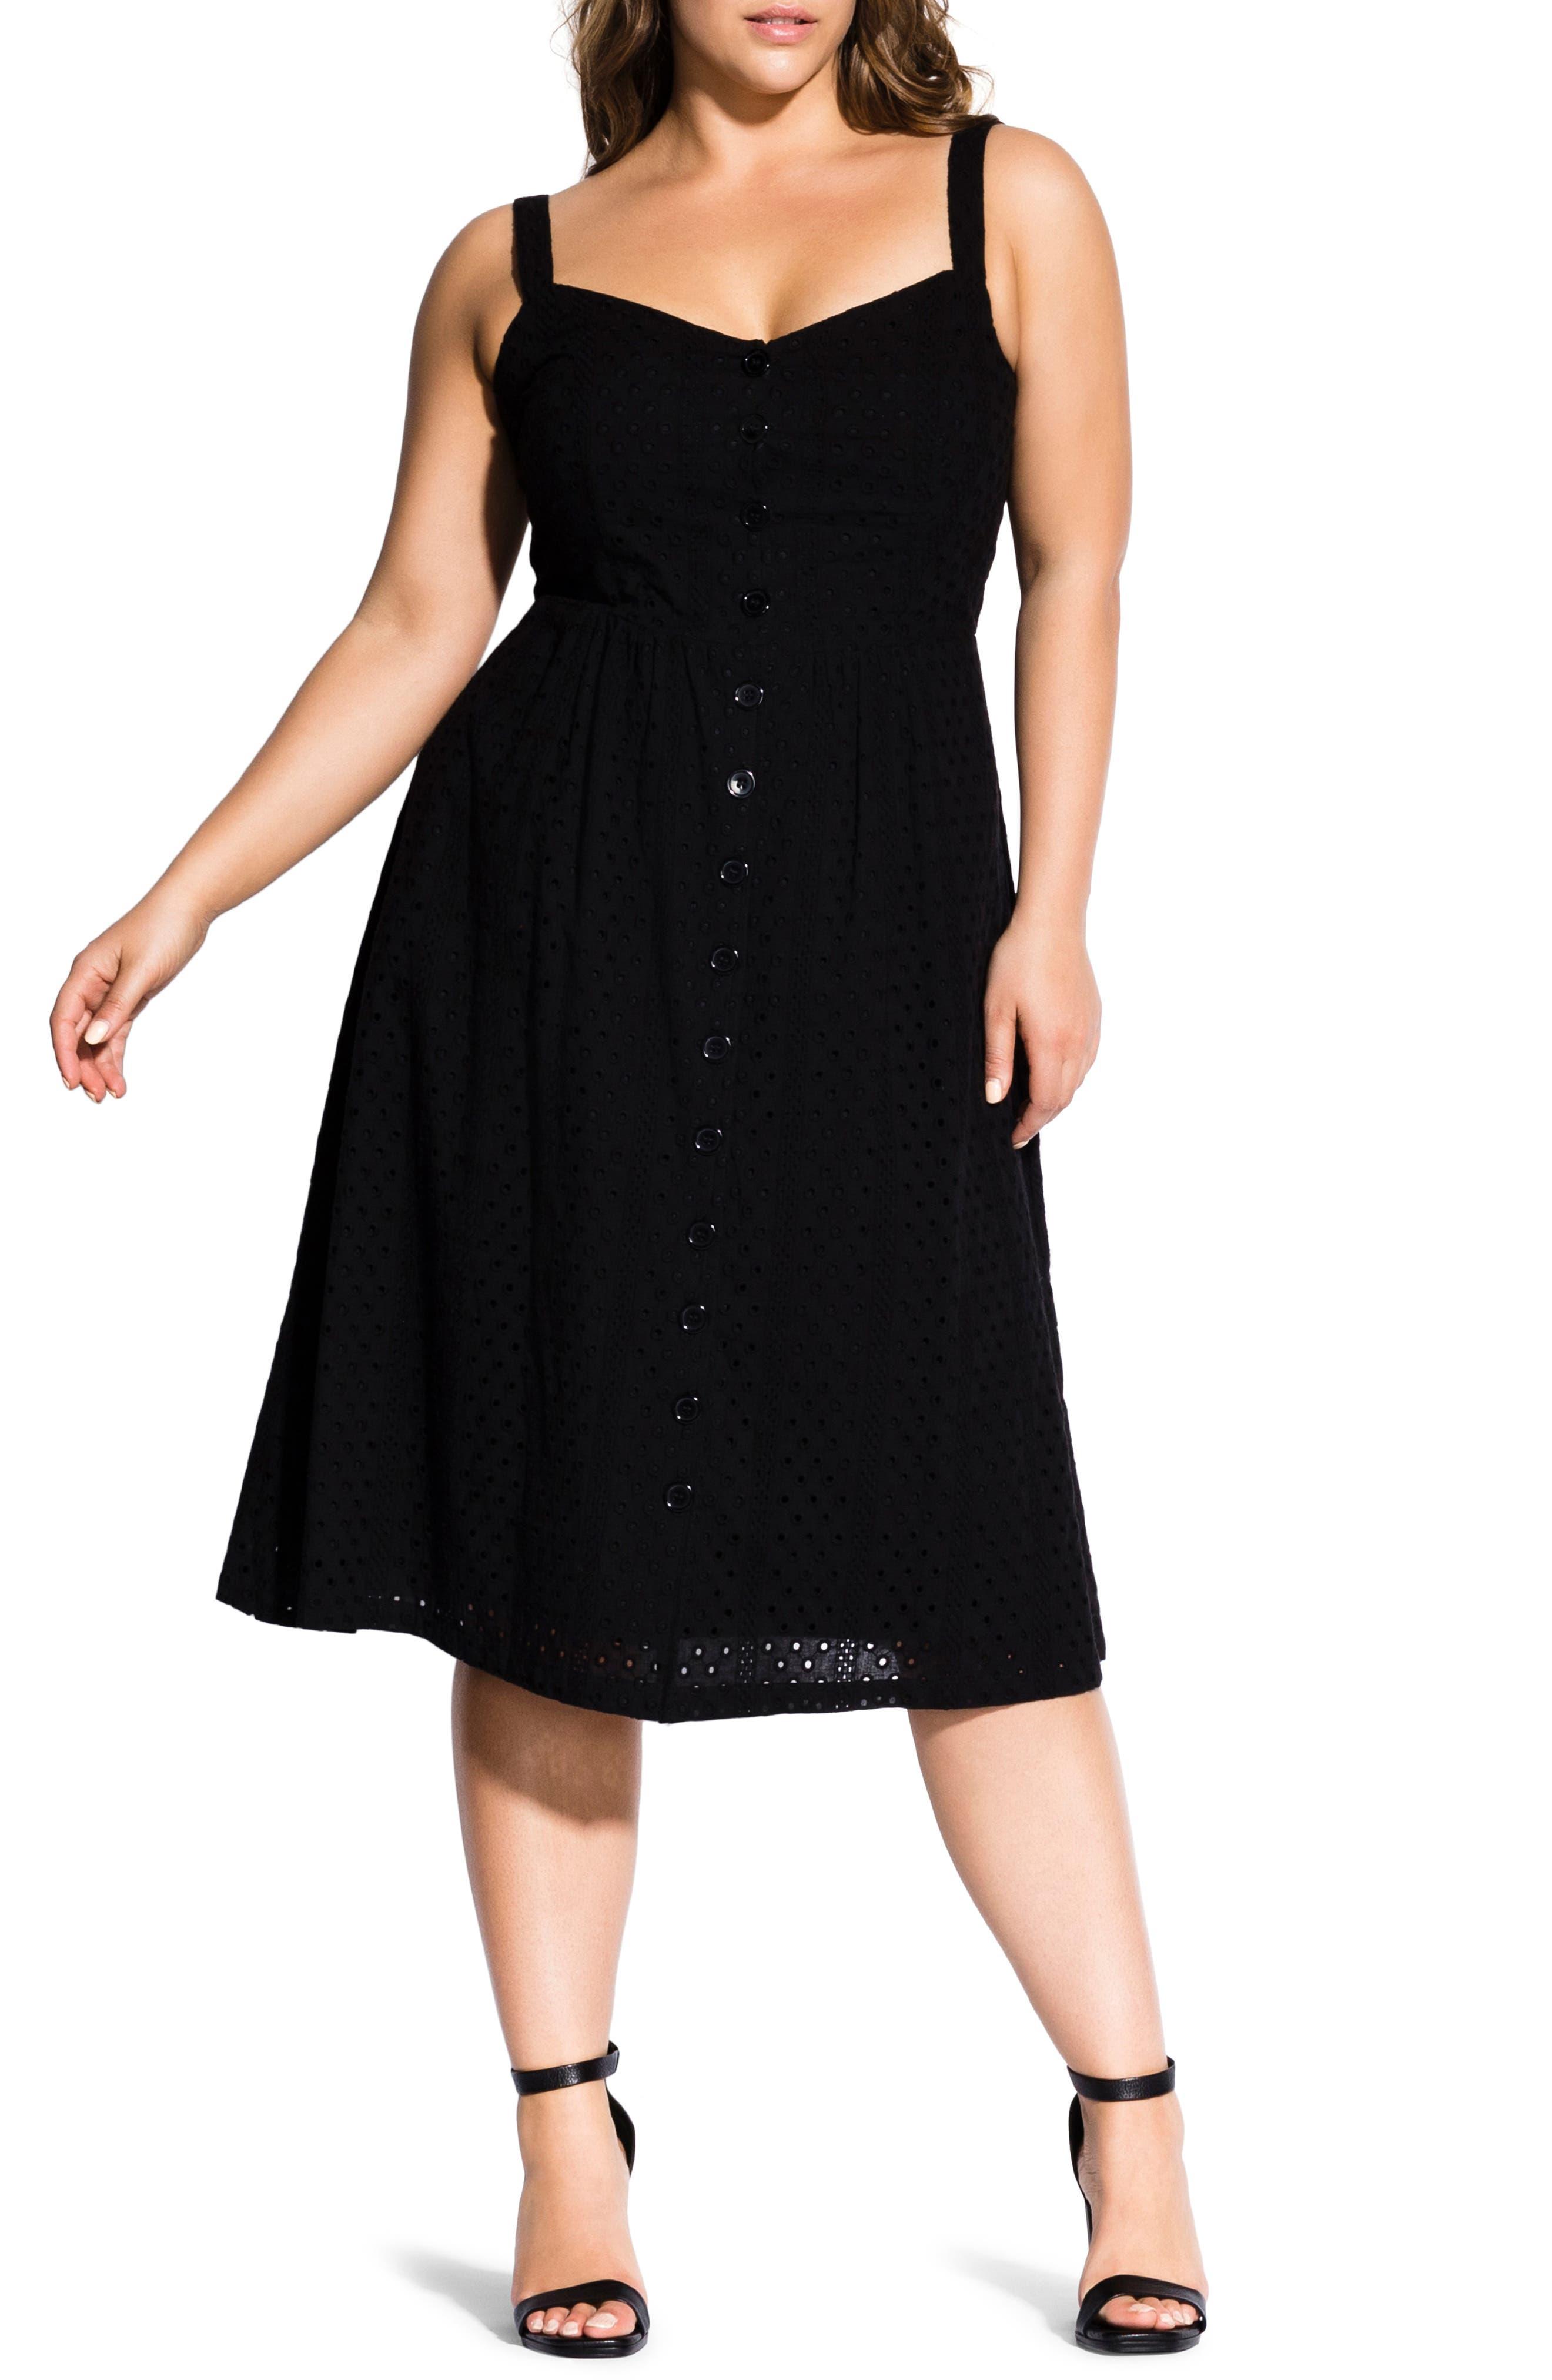 1950s Plus Size Dresses, Swing Dresses Plus Size Womens City Chic Eyelet Love Dress $83.30 AT vintagedancer.com